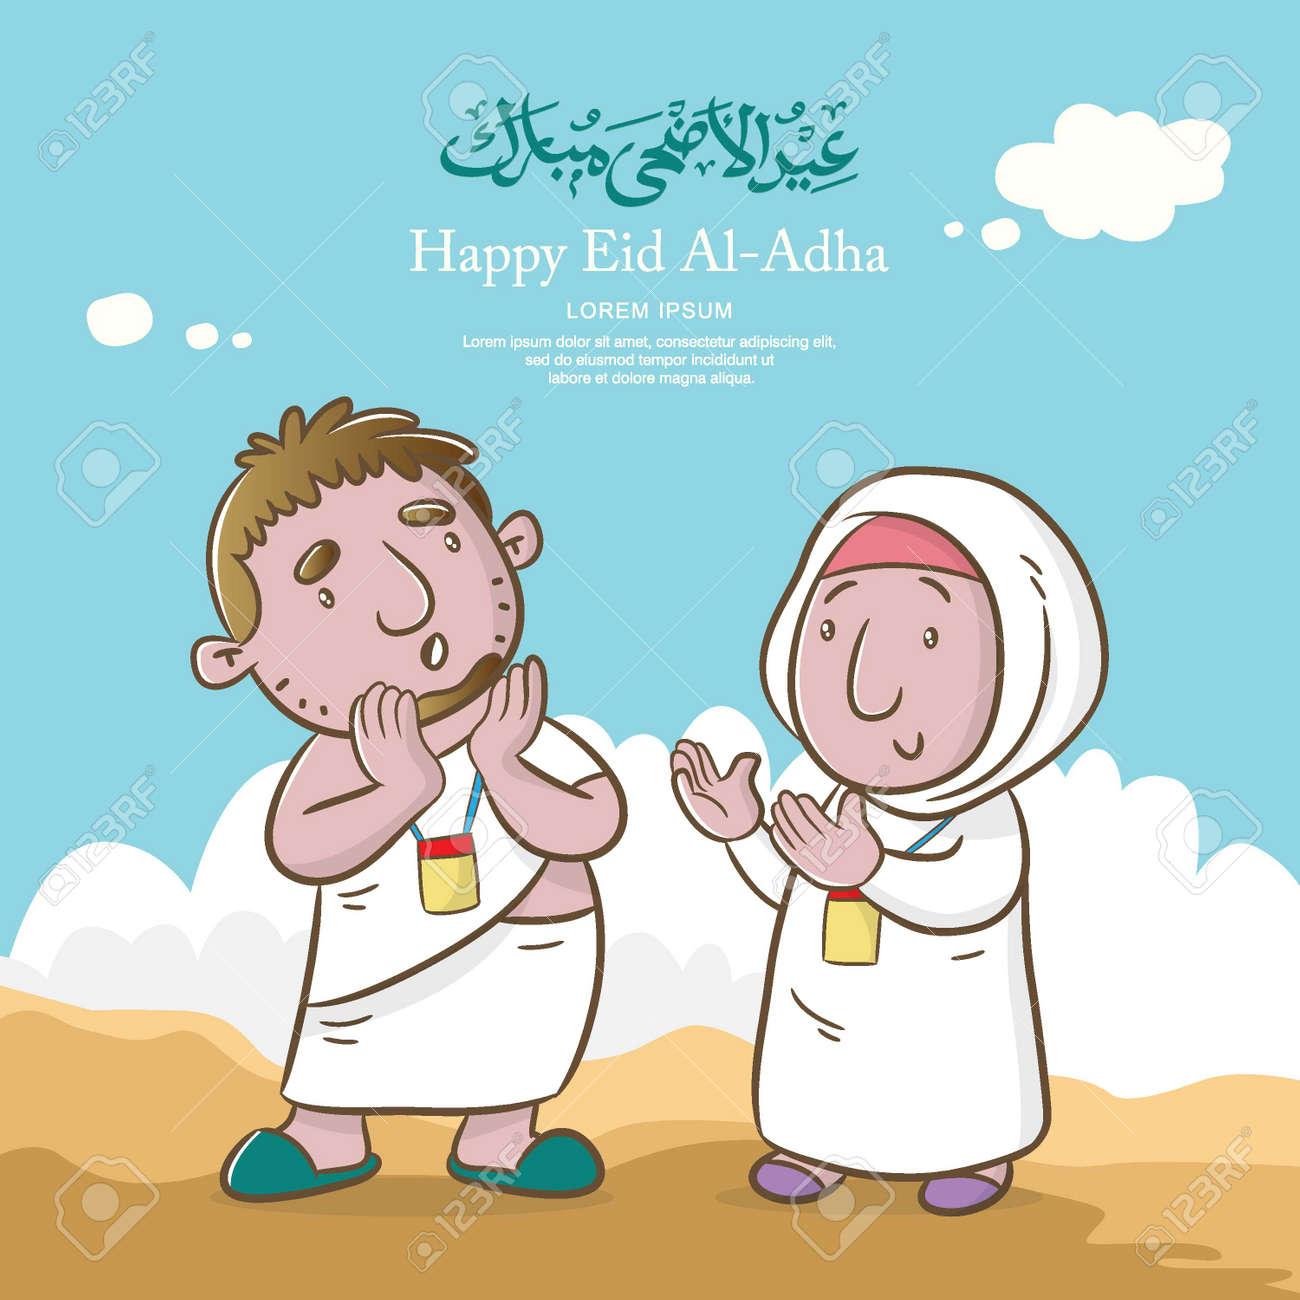 cute couple cartoon pray to allah, arabhic calligraphy mean happy eid adha, desert background - 128375739